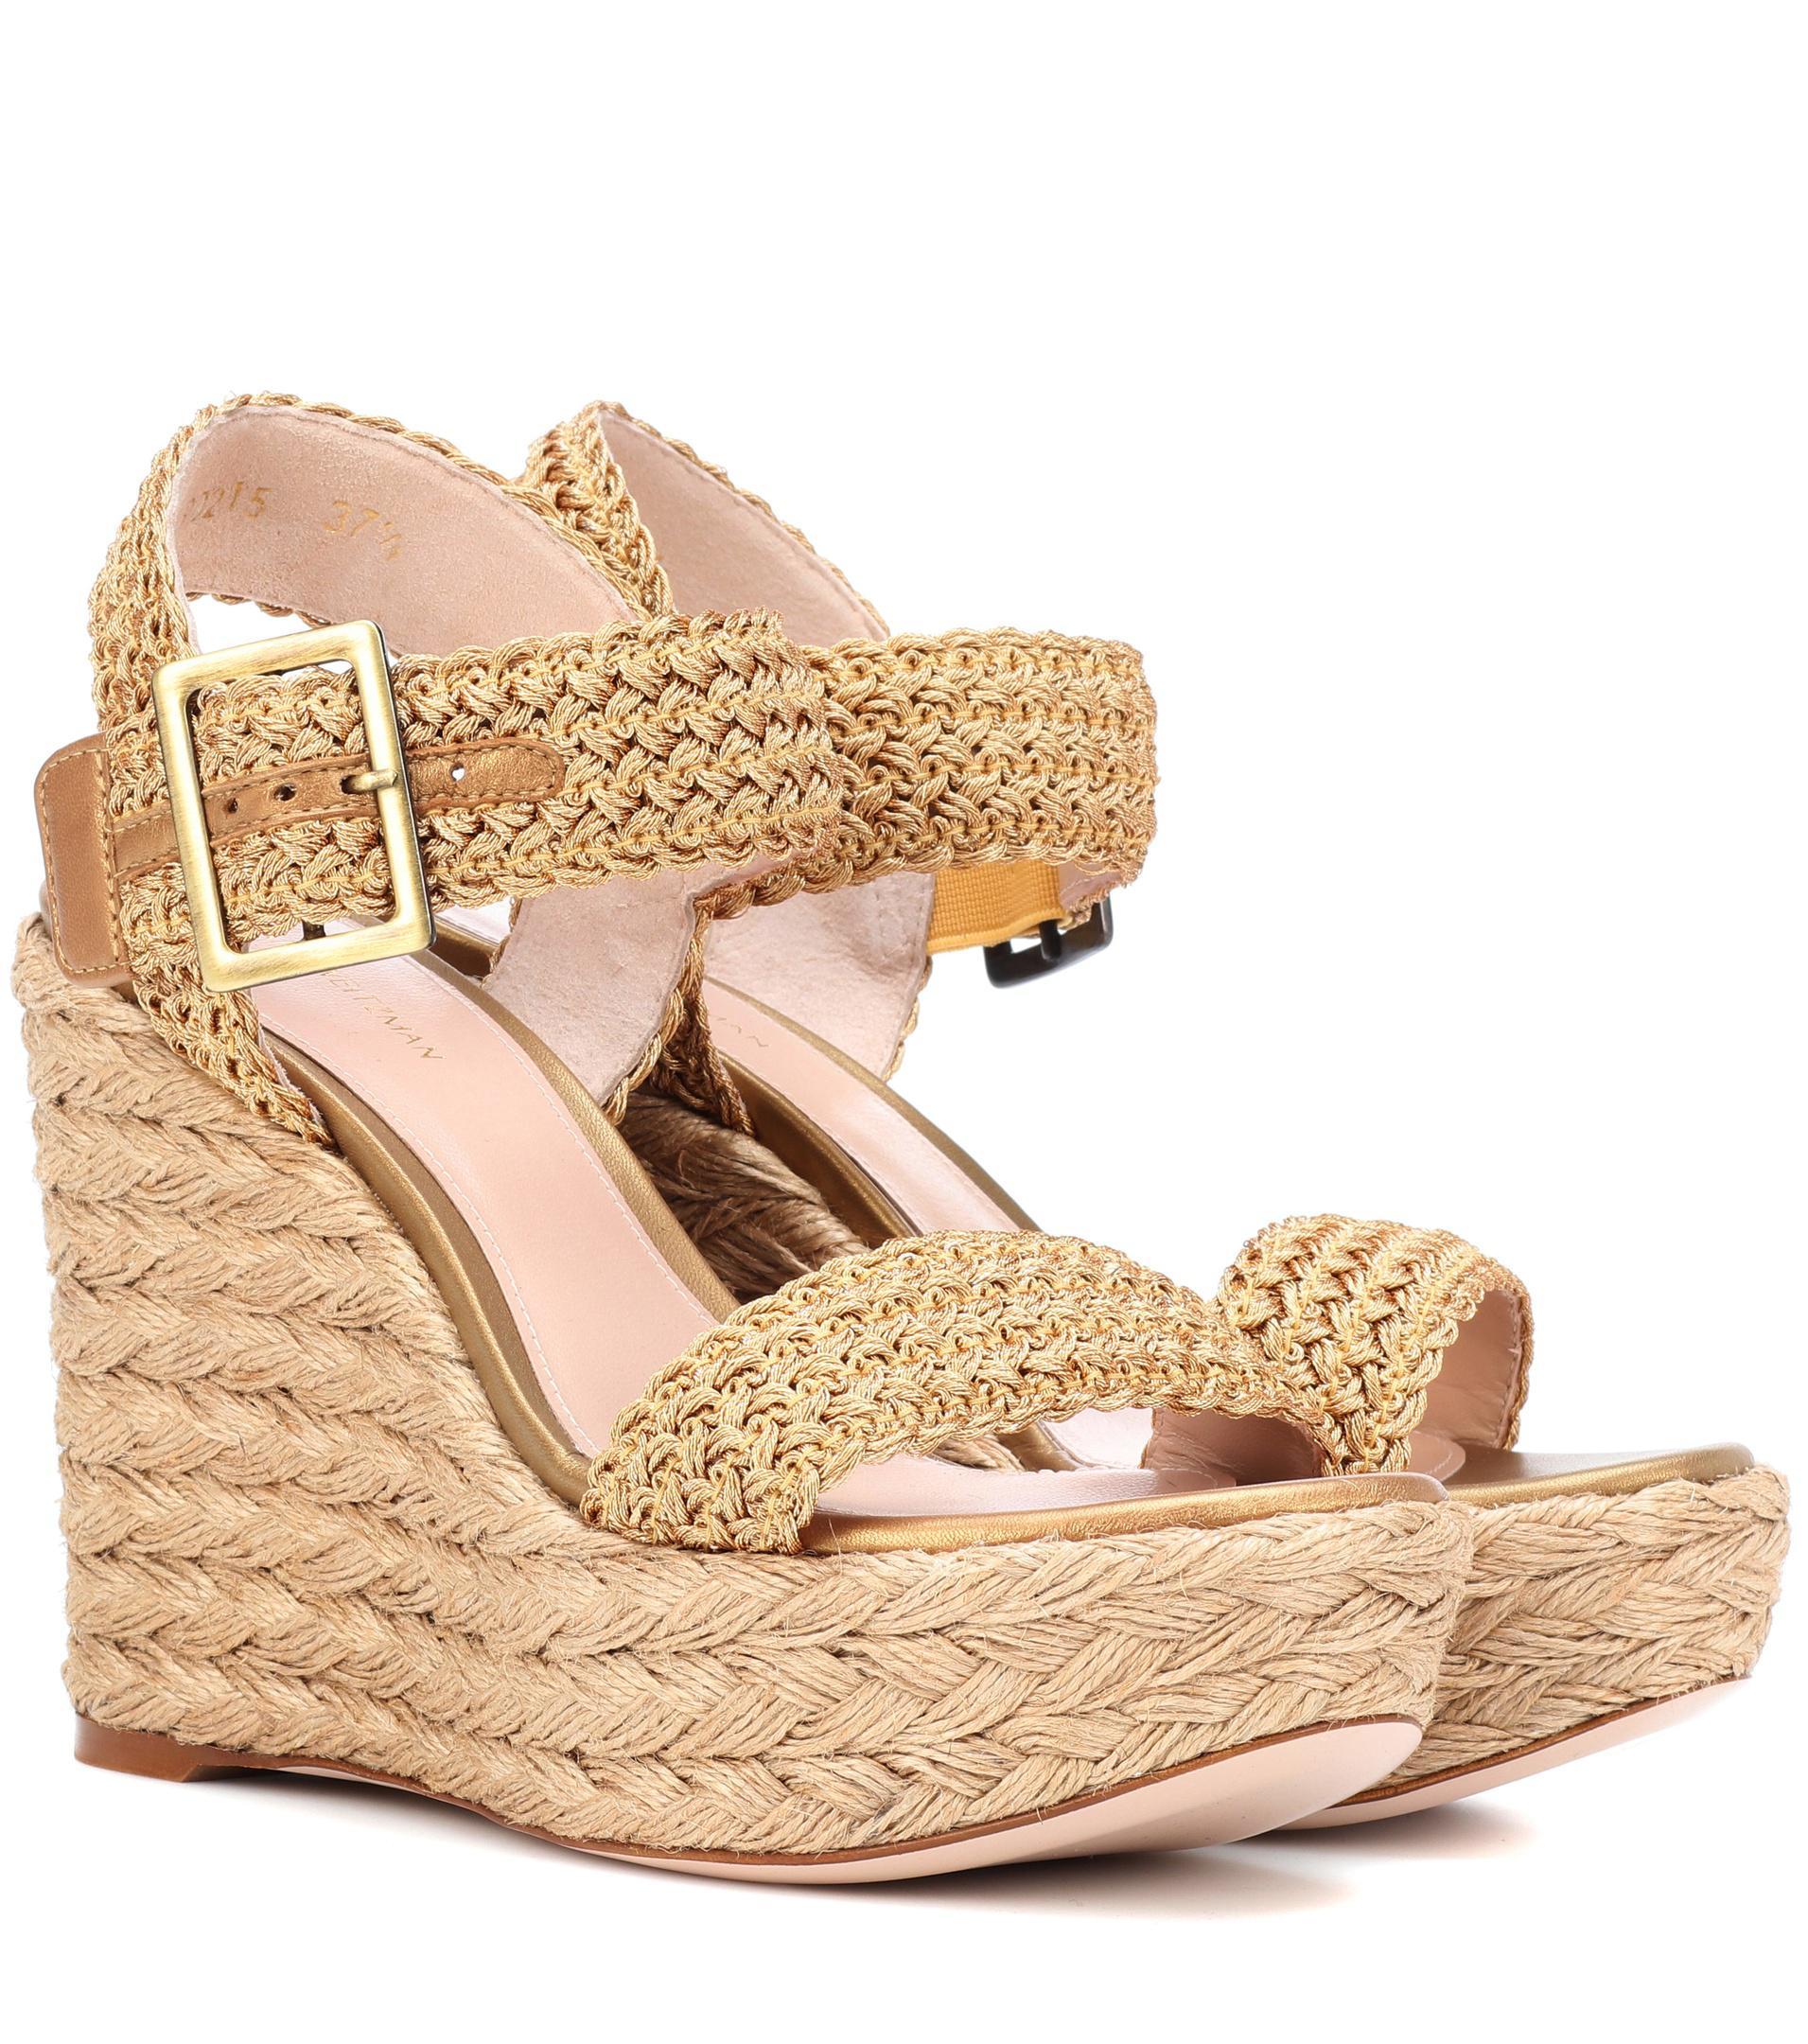 771b867ff2a Stuart Weitzman Alexis Bingo Wedge Sandals in Metallic - Lyst